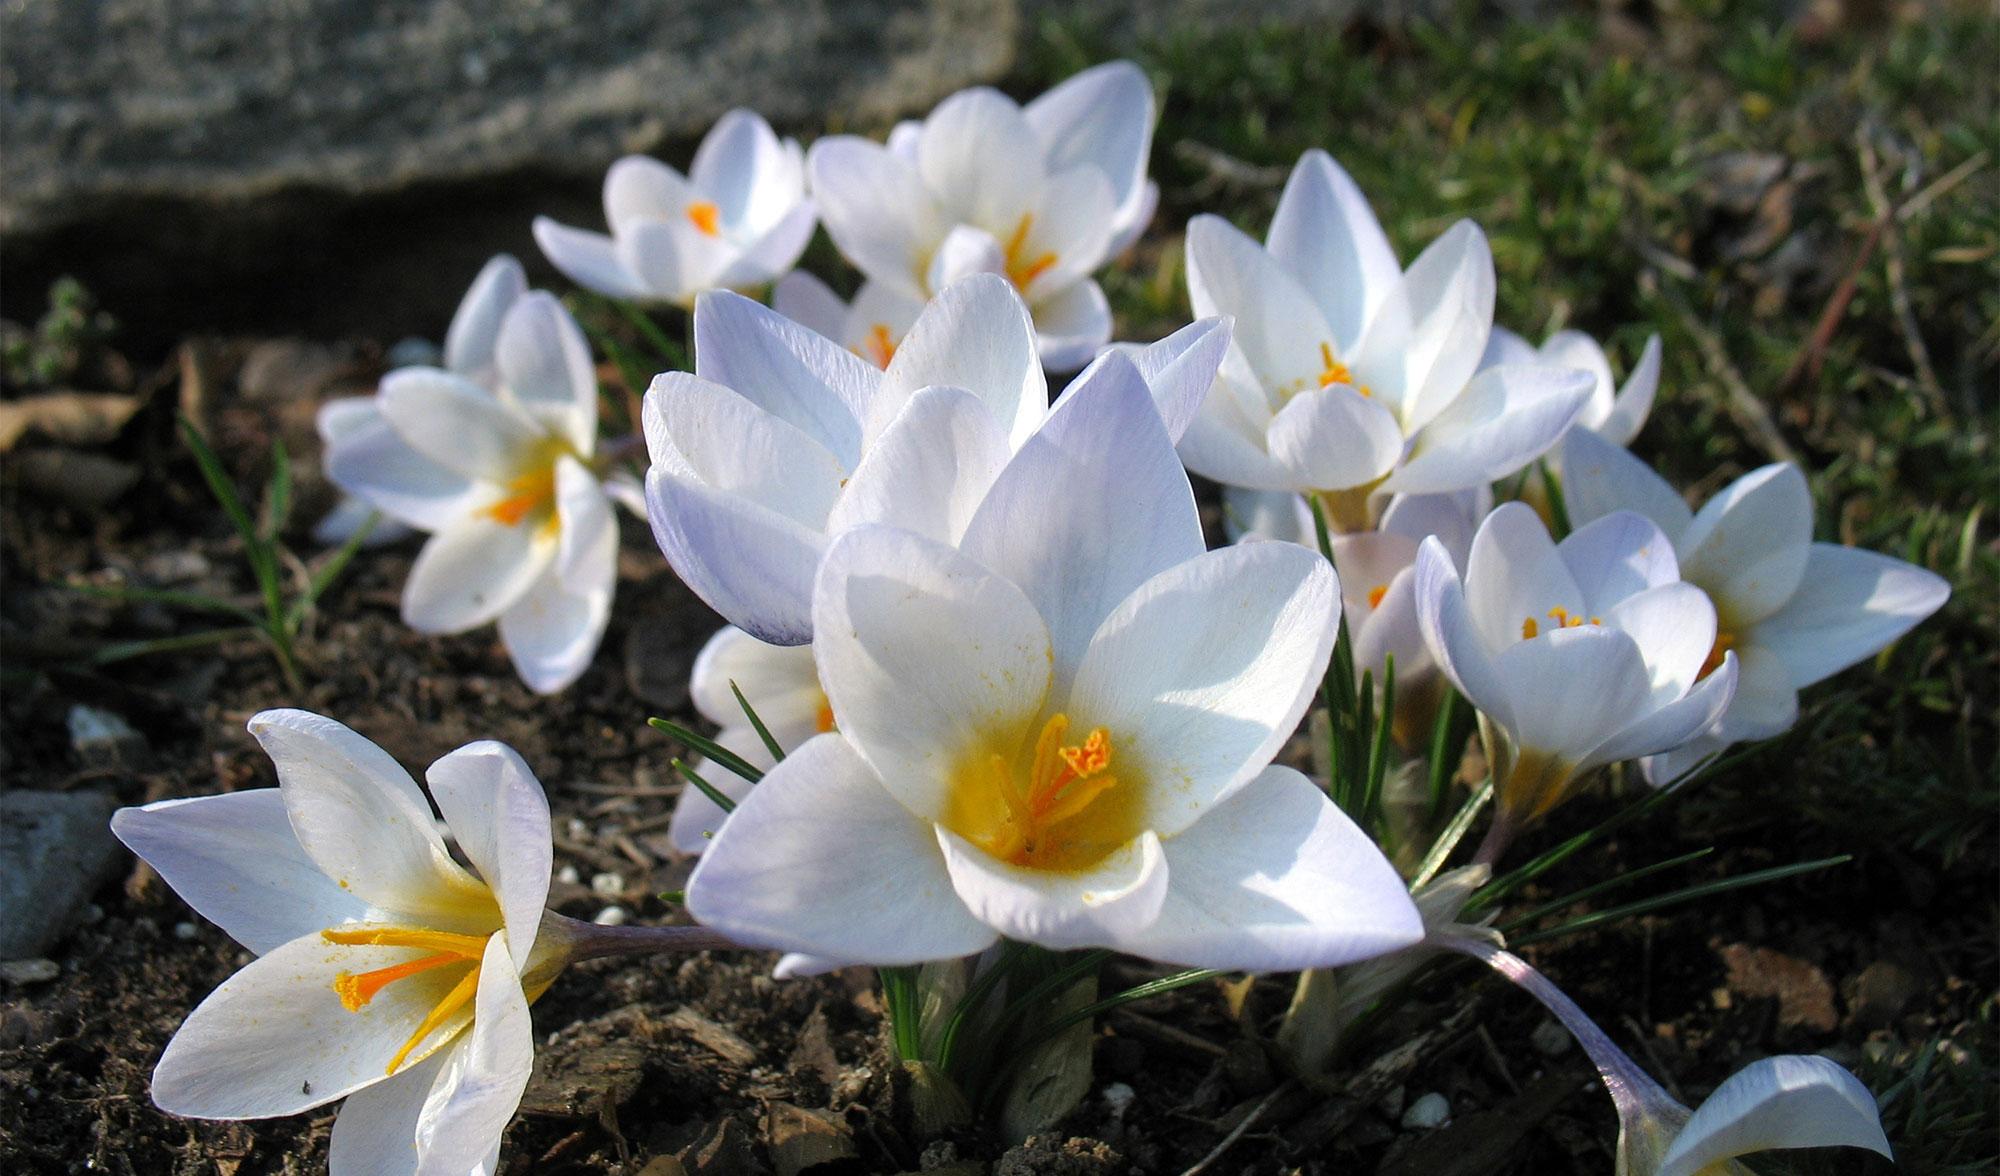 The Early Spring Garden. White crocuses.